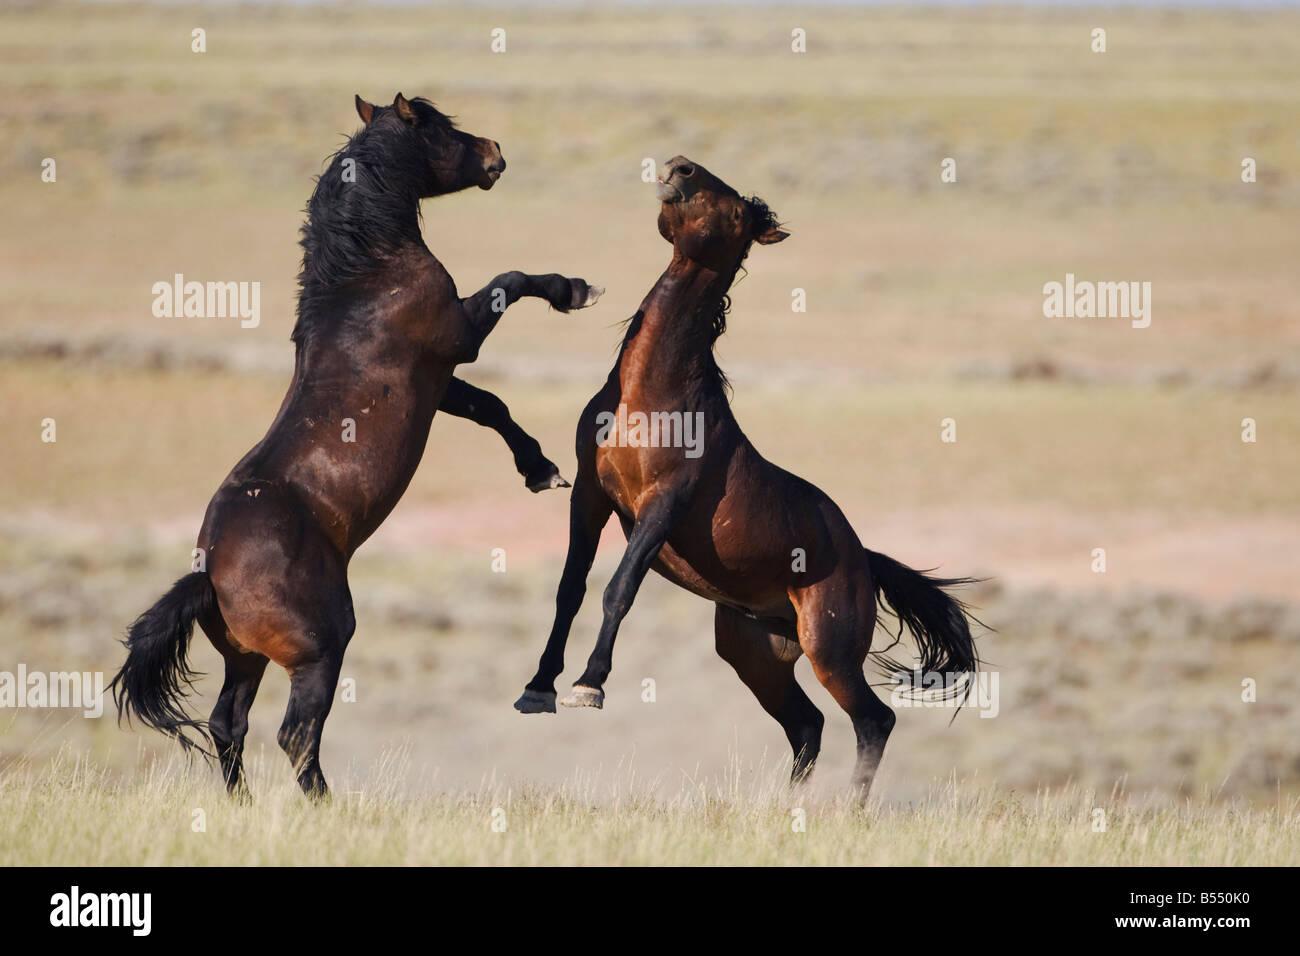 Mustang Pferd Equus Caballus Hengste kämpfen Pryor Wild Horse Bergkette Montana USA Stockbild